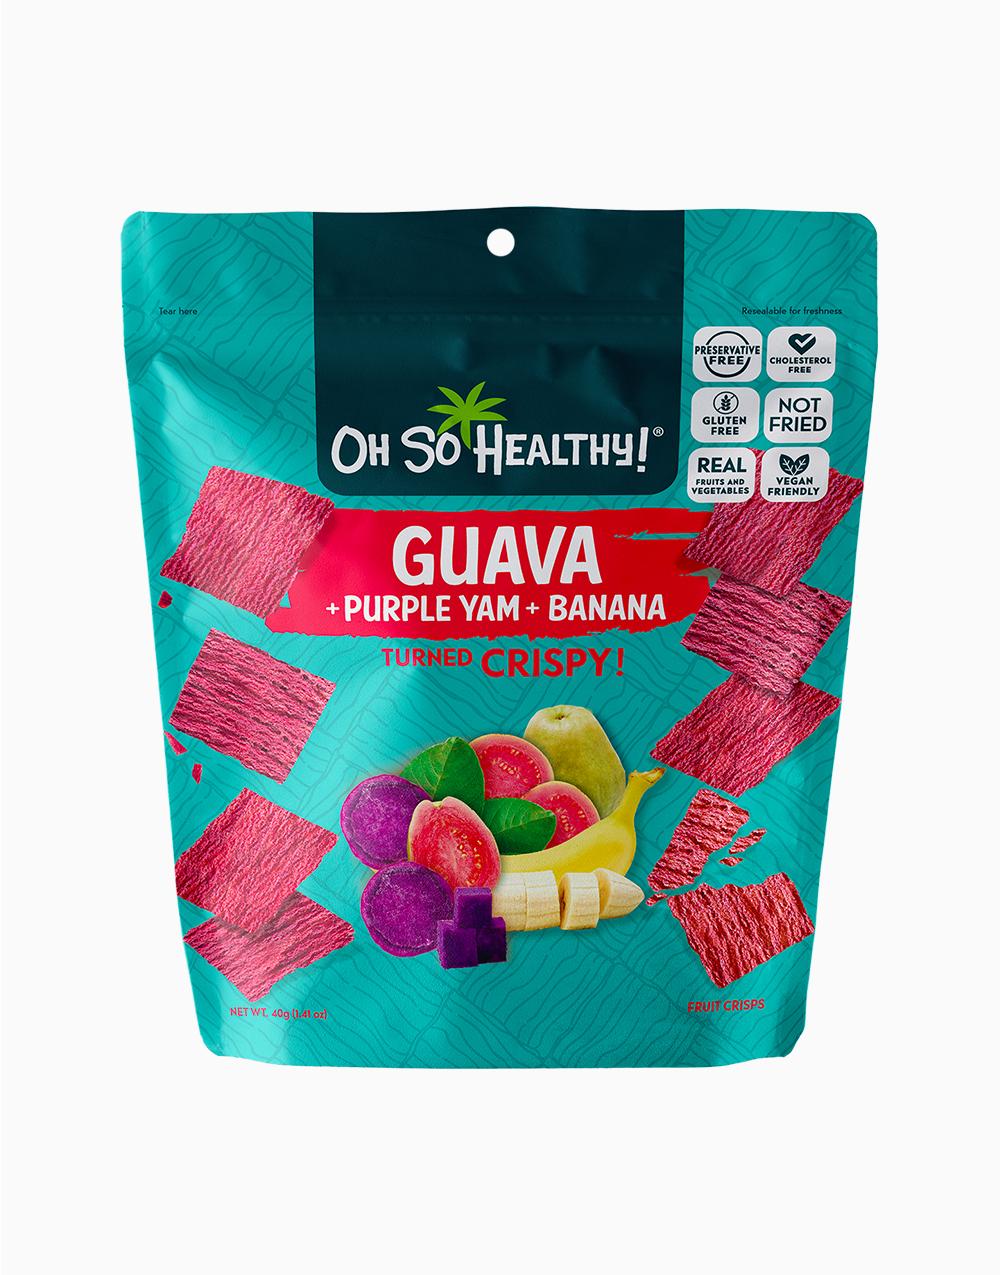 Guava Purple Yam Banana Fruit Crisps by Oh So Healthy!